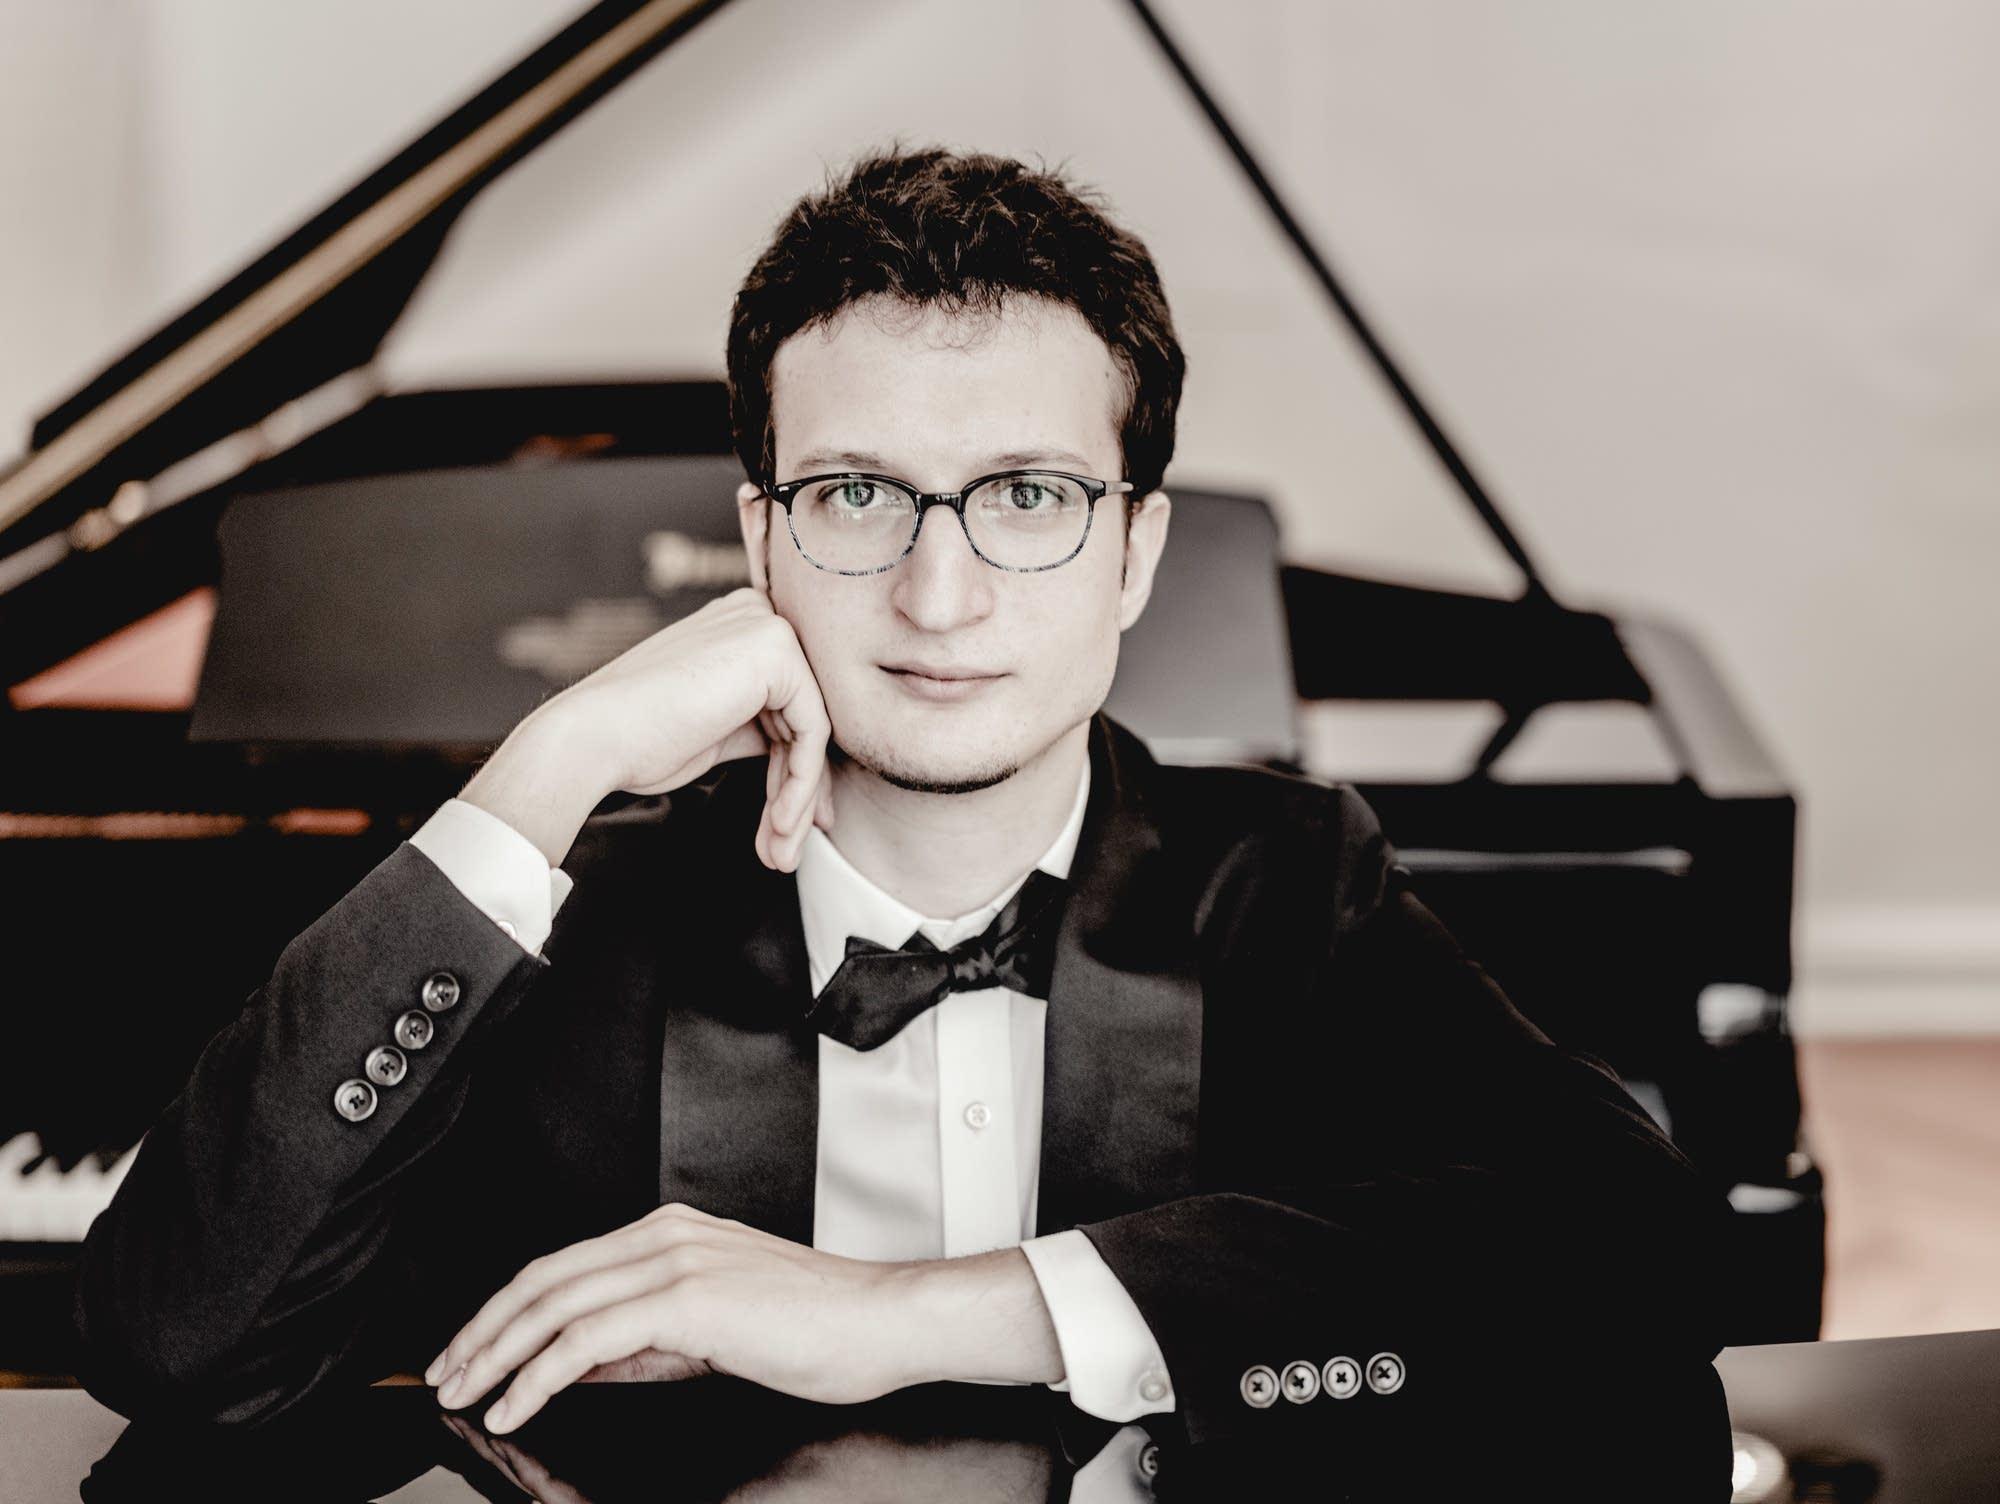 Pianist Rodolfo Leone